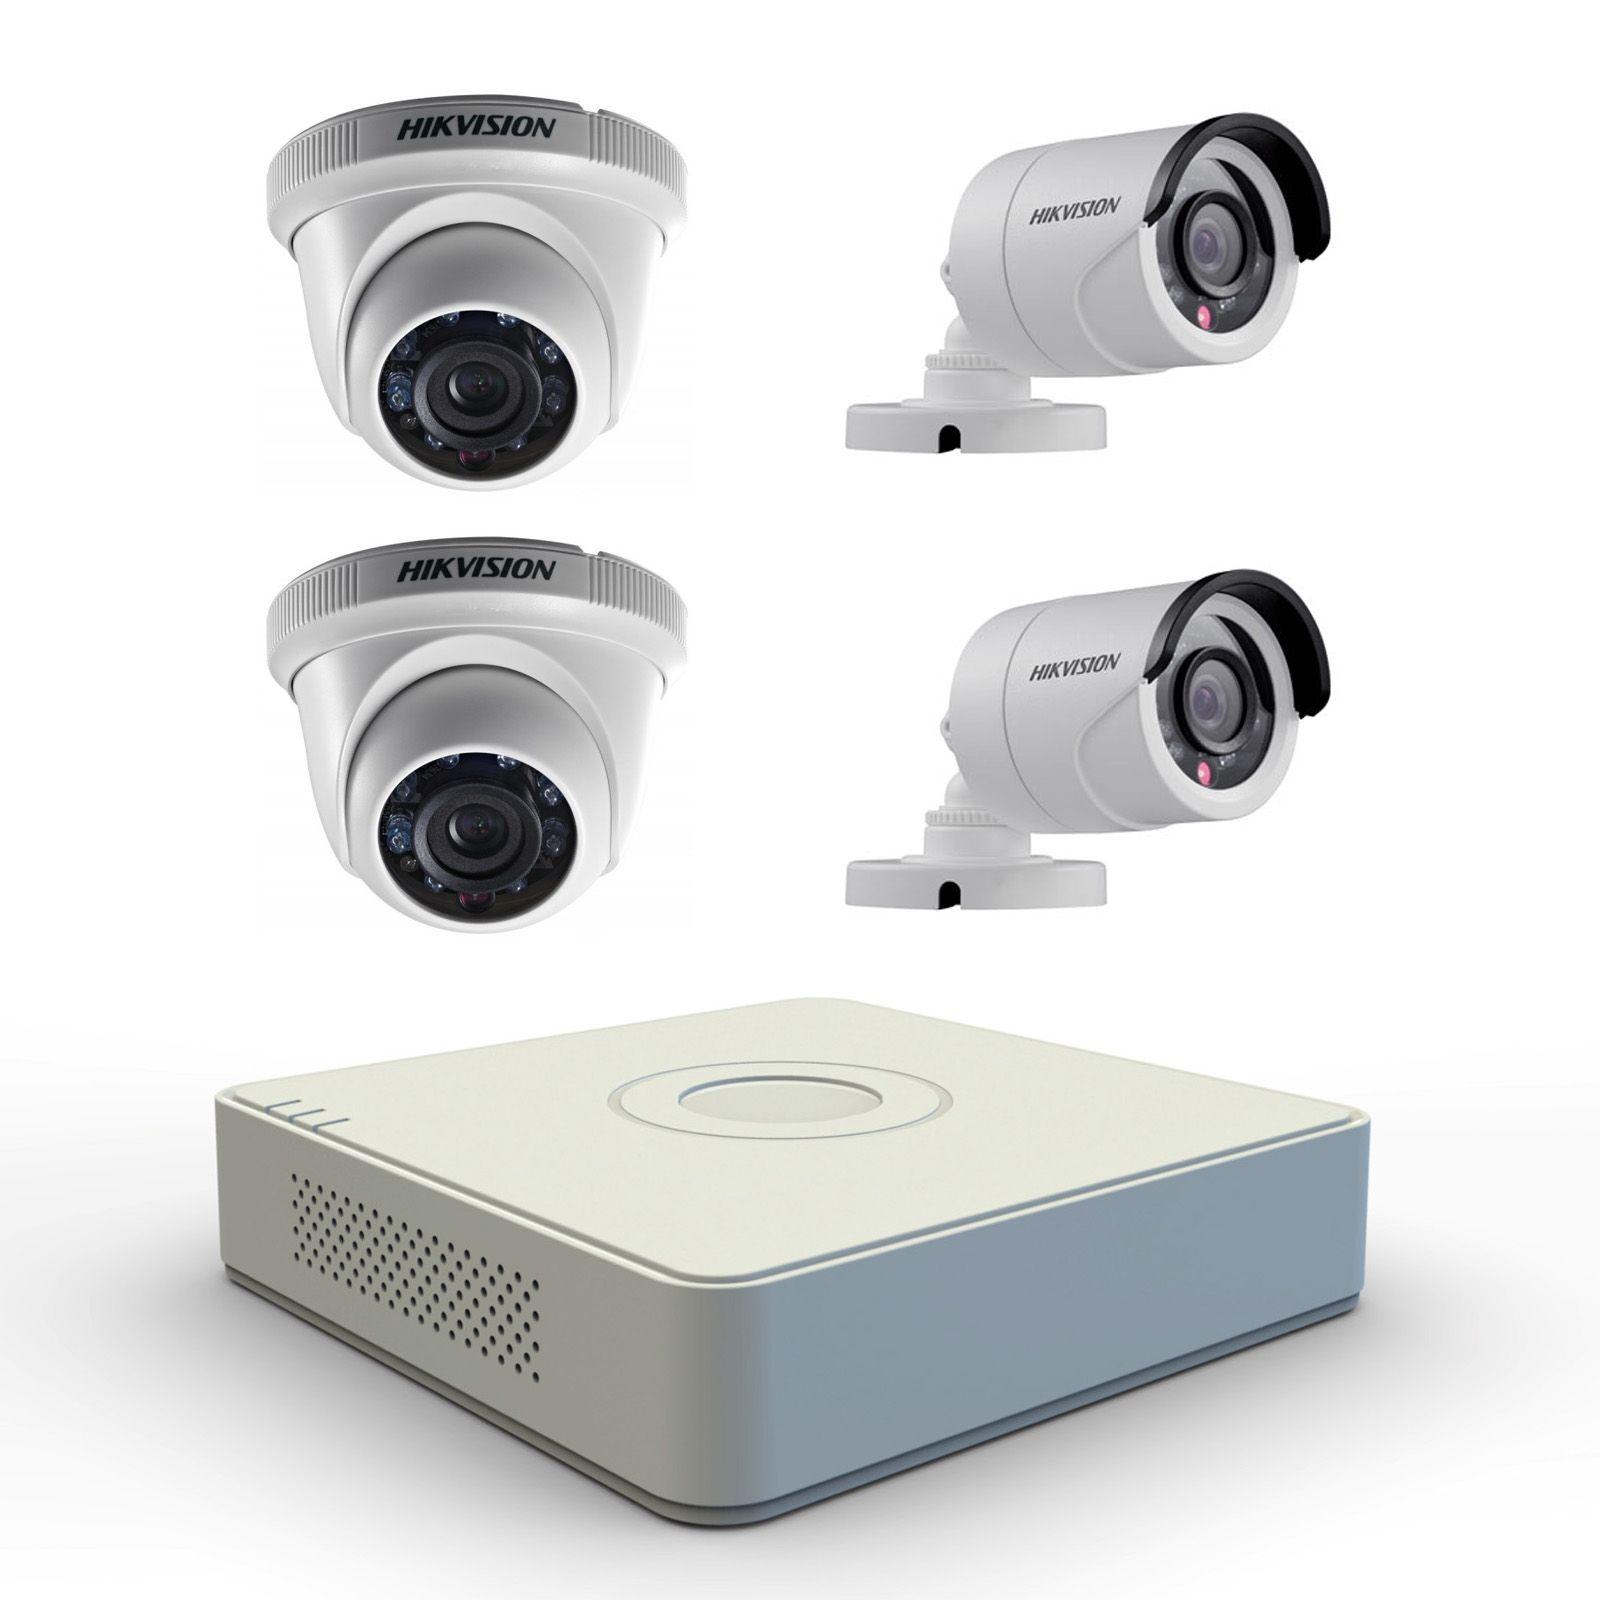 Hikvision 4 Channel DVR + 2 IR Dome Cameras + 2 IR Bullet Cameras ...